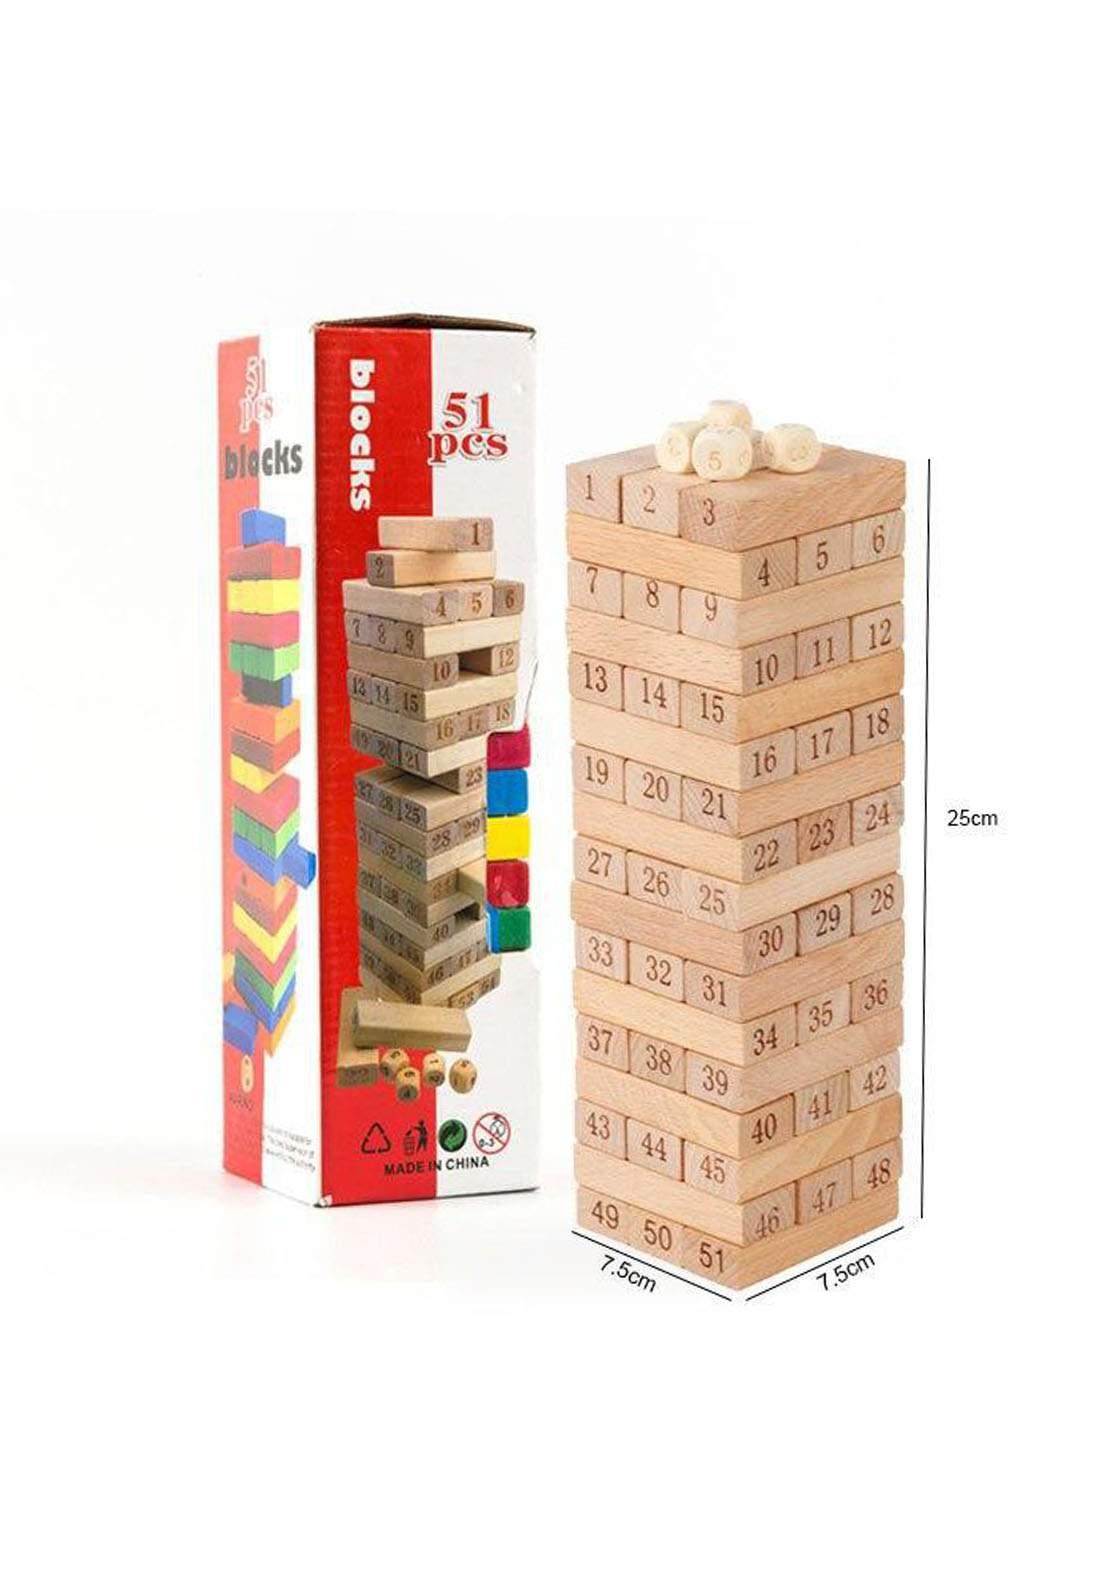 Wooden Stacking Tower Numbers Building Blocks Game Board for Kids 54 Pcs لعبة البرج الخشبي